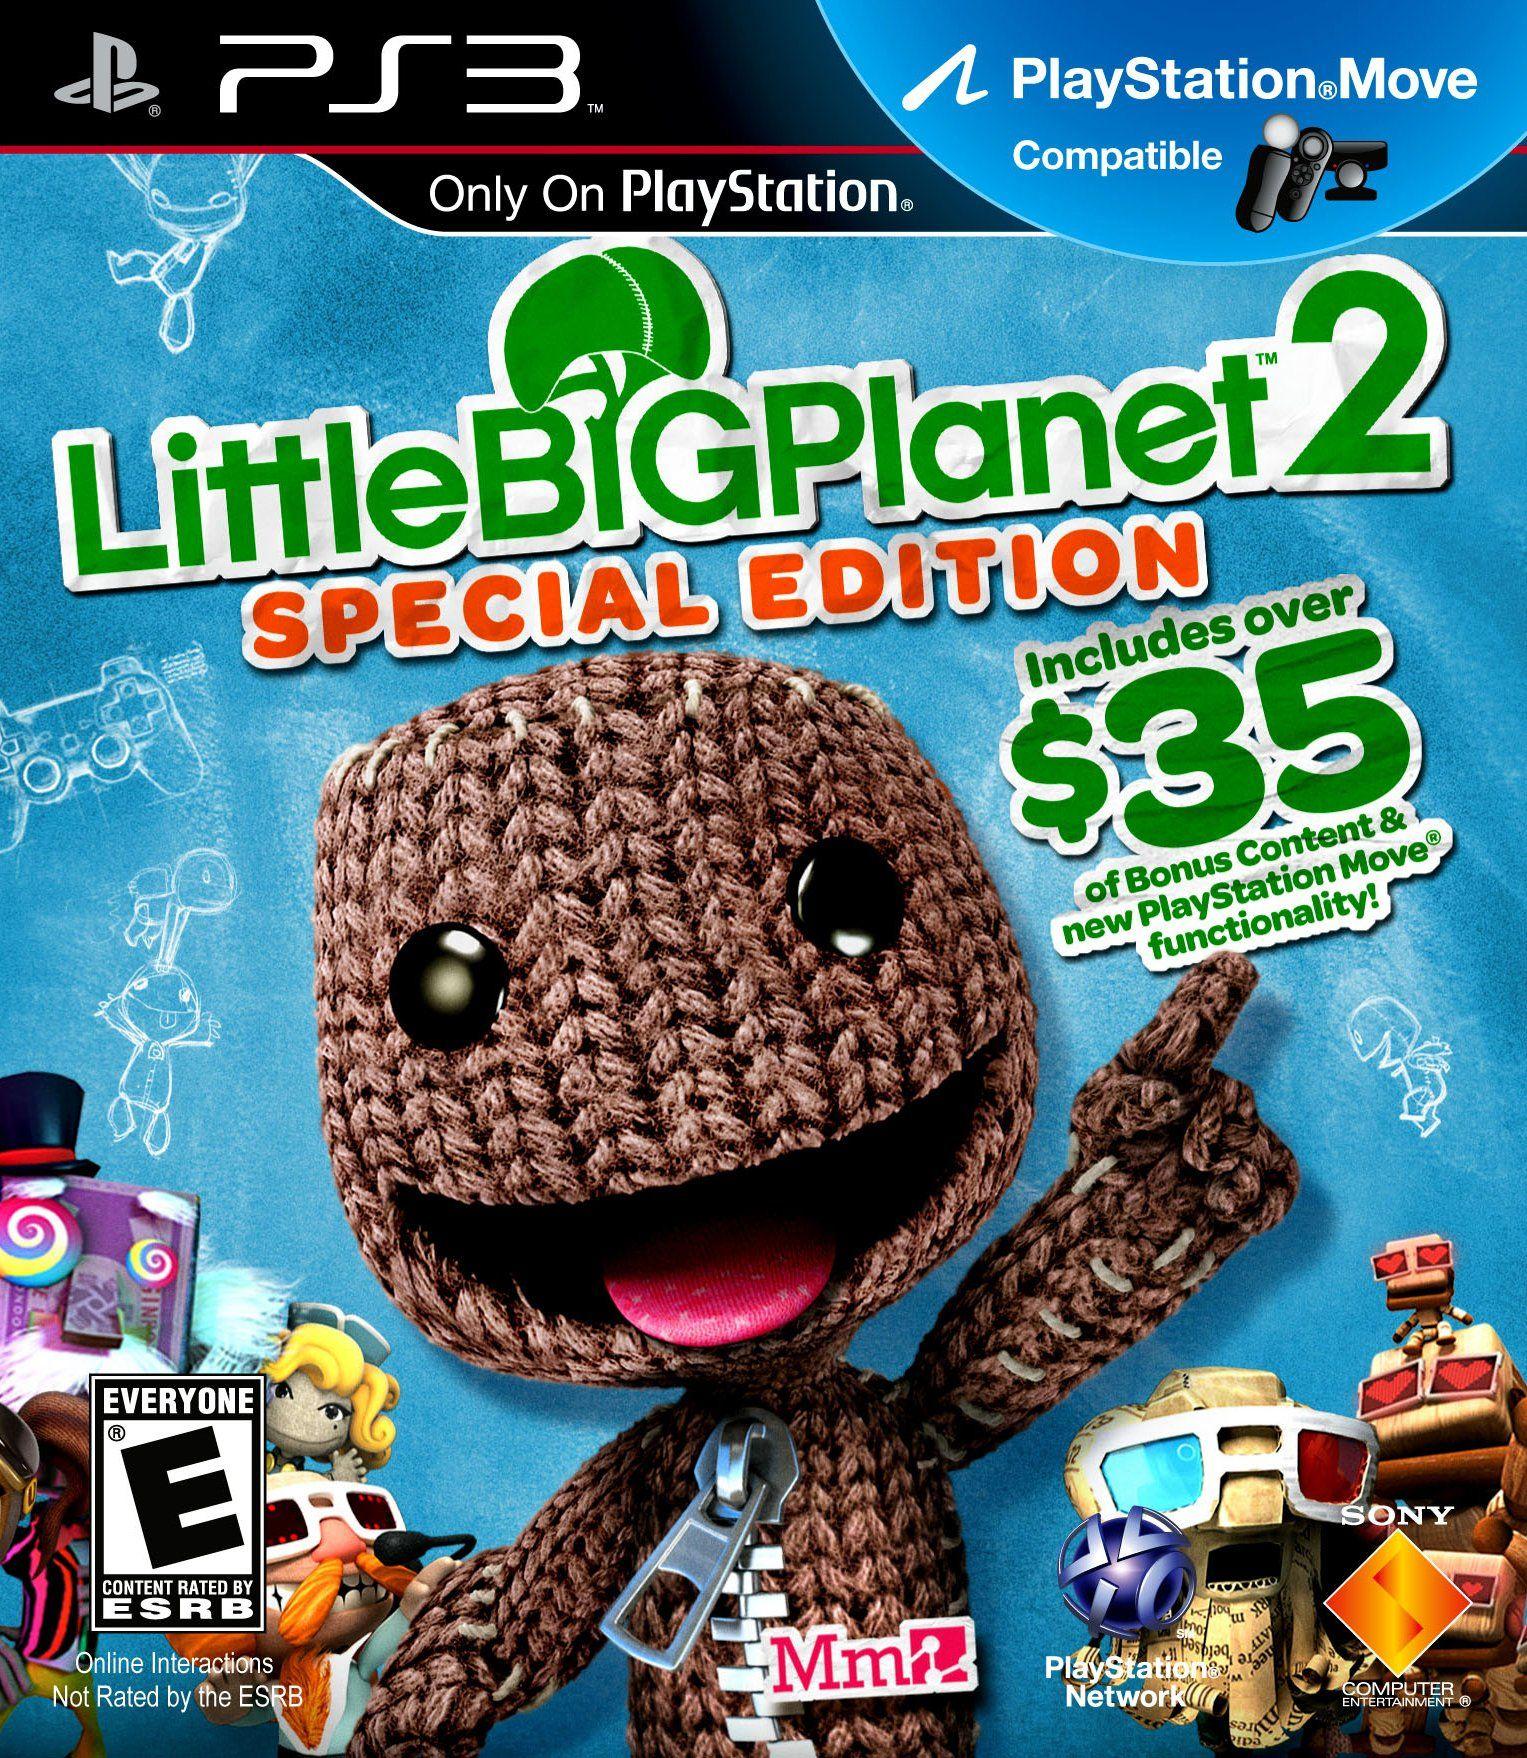 Ziz Amazon Com Ps3 Little Big Planet 2 Special Edition Video Games Little Big Planet Video Game Collection Playstation